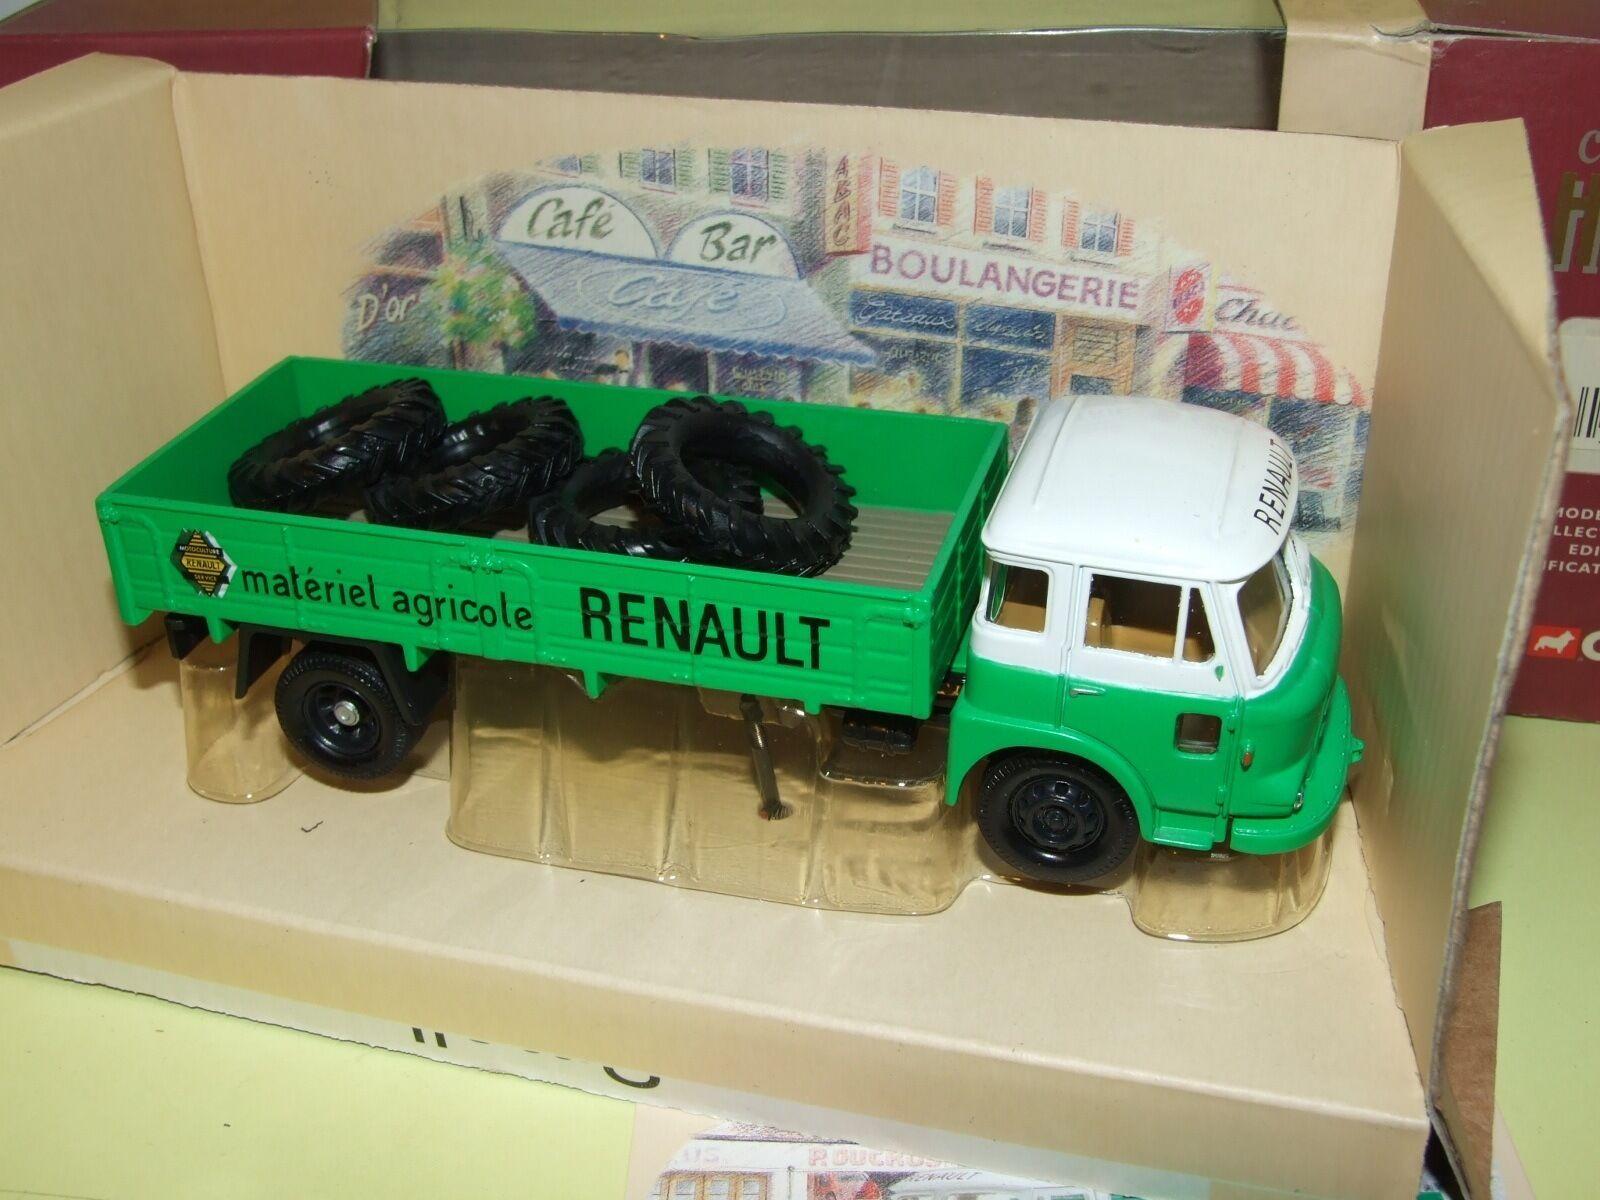 SAVIEM JL à RIDELLES RENAULT AGRICOLE CORGI EX71601 1 50